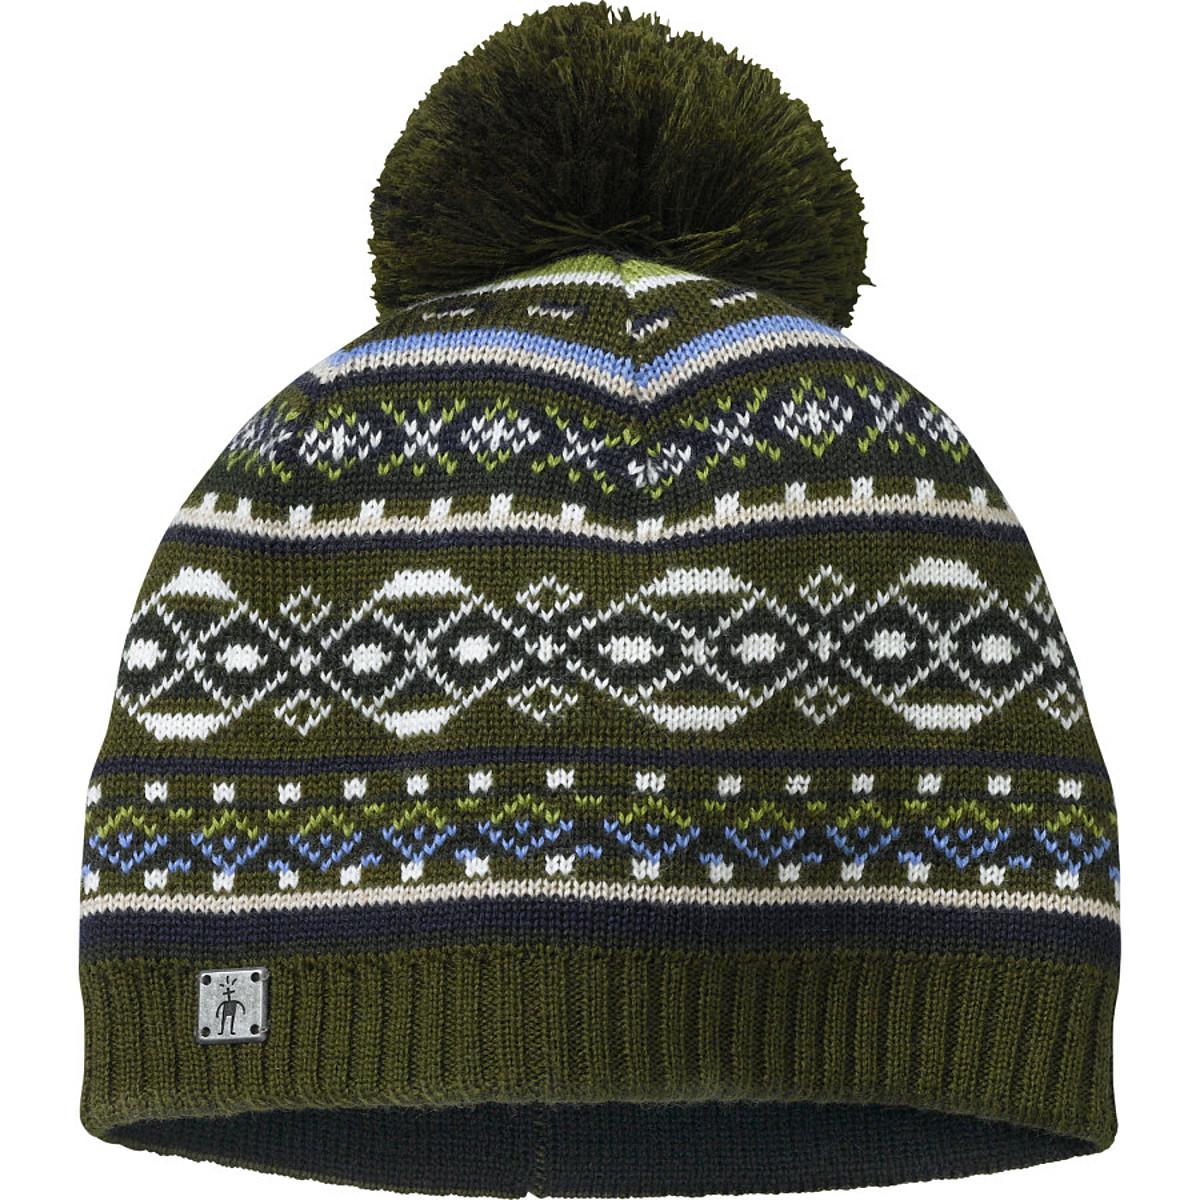 Smartwool Fairview Fairisle Pom Hat